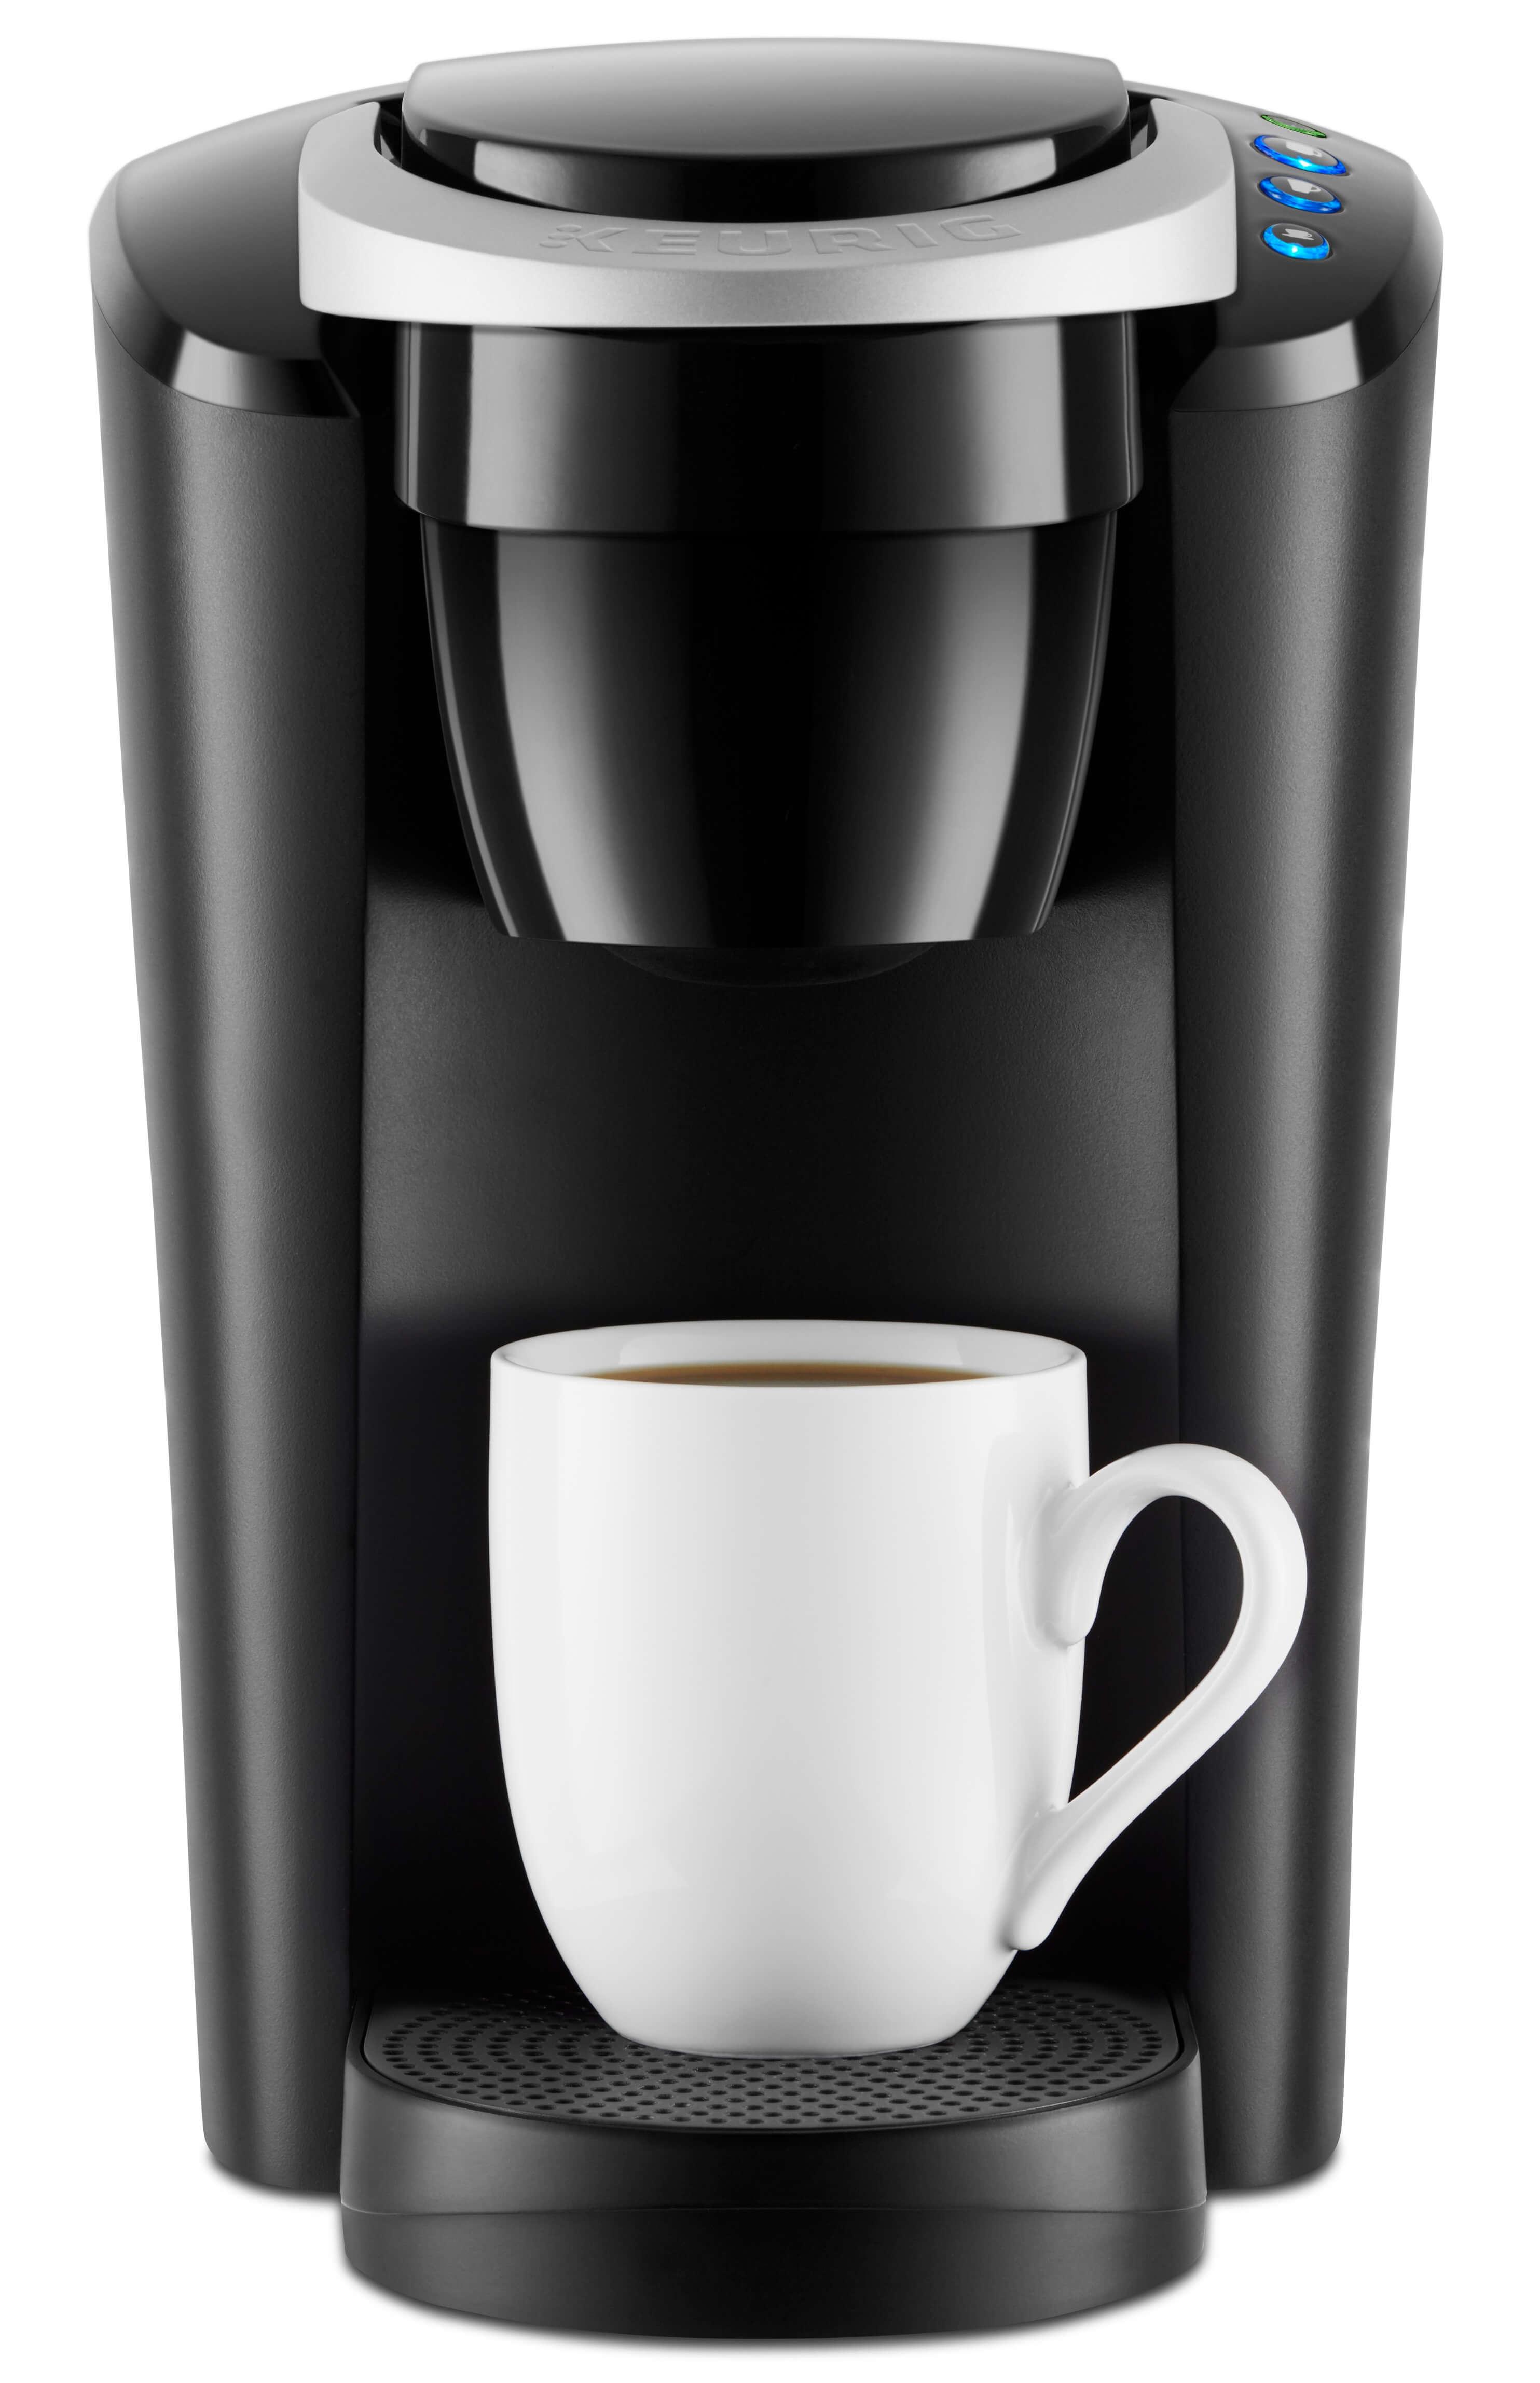 Keurig K Compact Single Serve K Cup Pod Coffee Maker Black